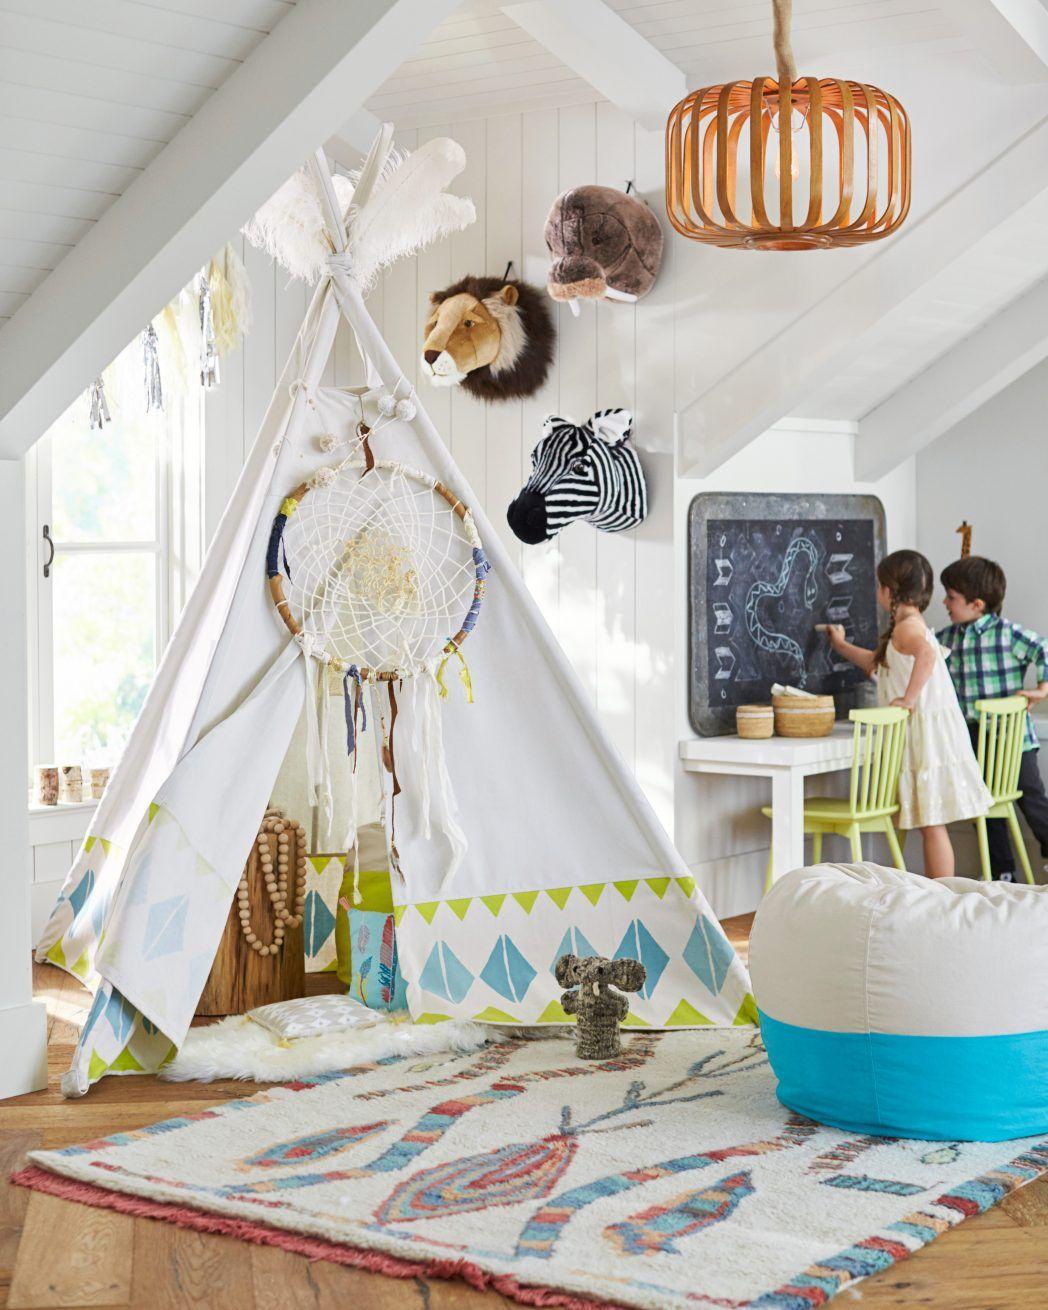 Jk Tee Pee Room Potterybarn Kids Beds Cool Collaboration Jenni Kayne